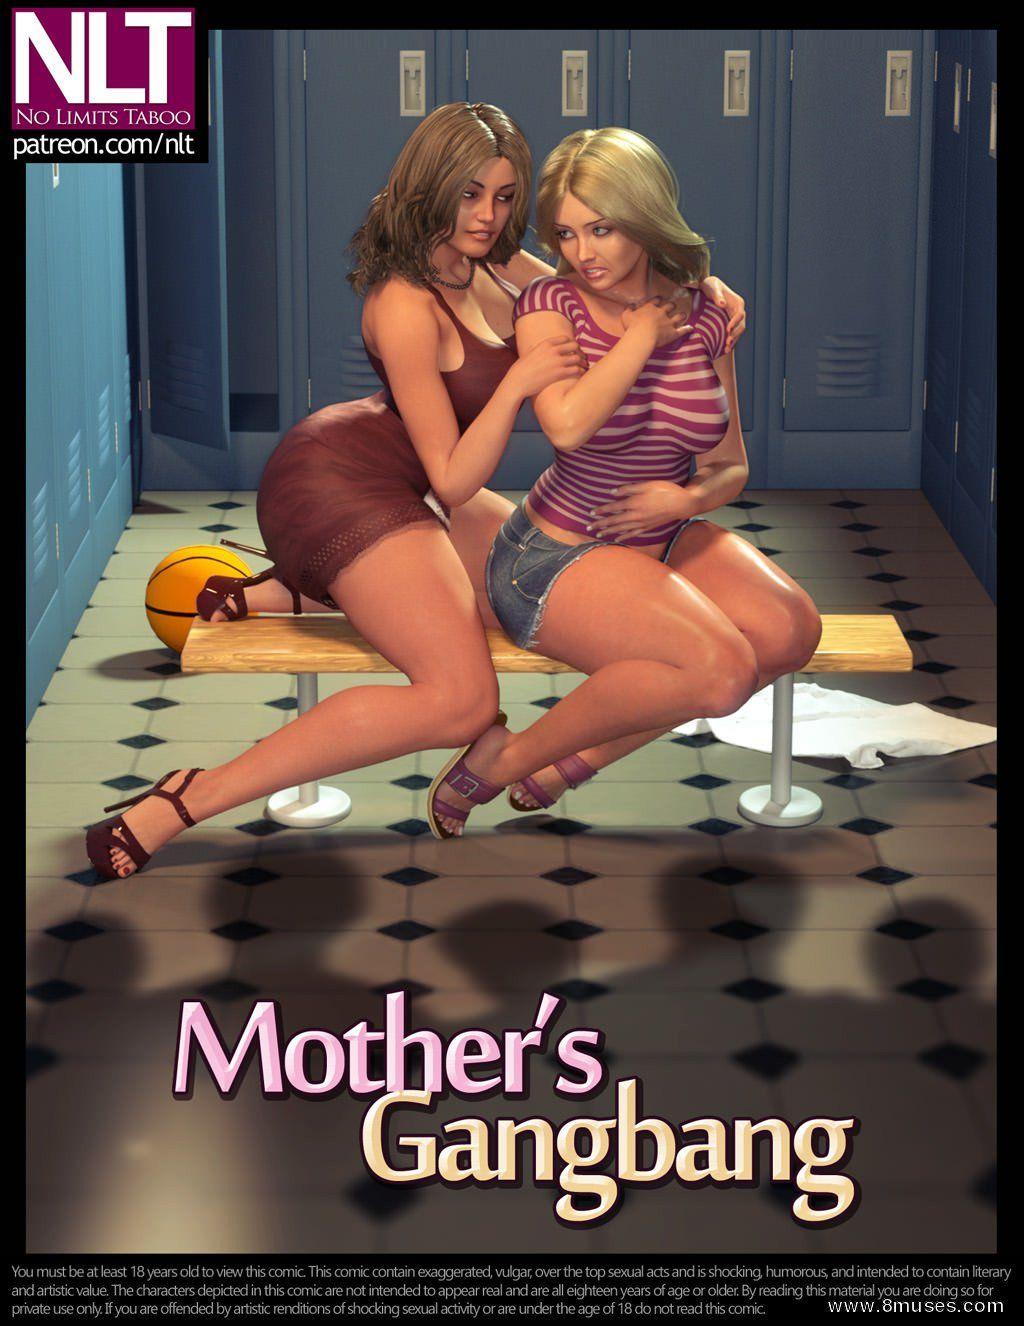 [NLT MEDIA] Mothers Gangbang